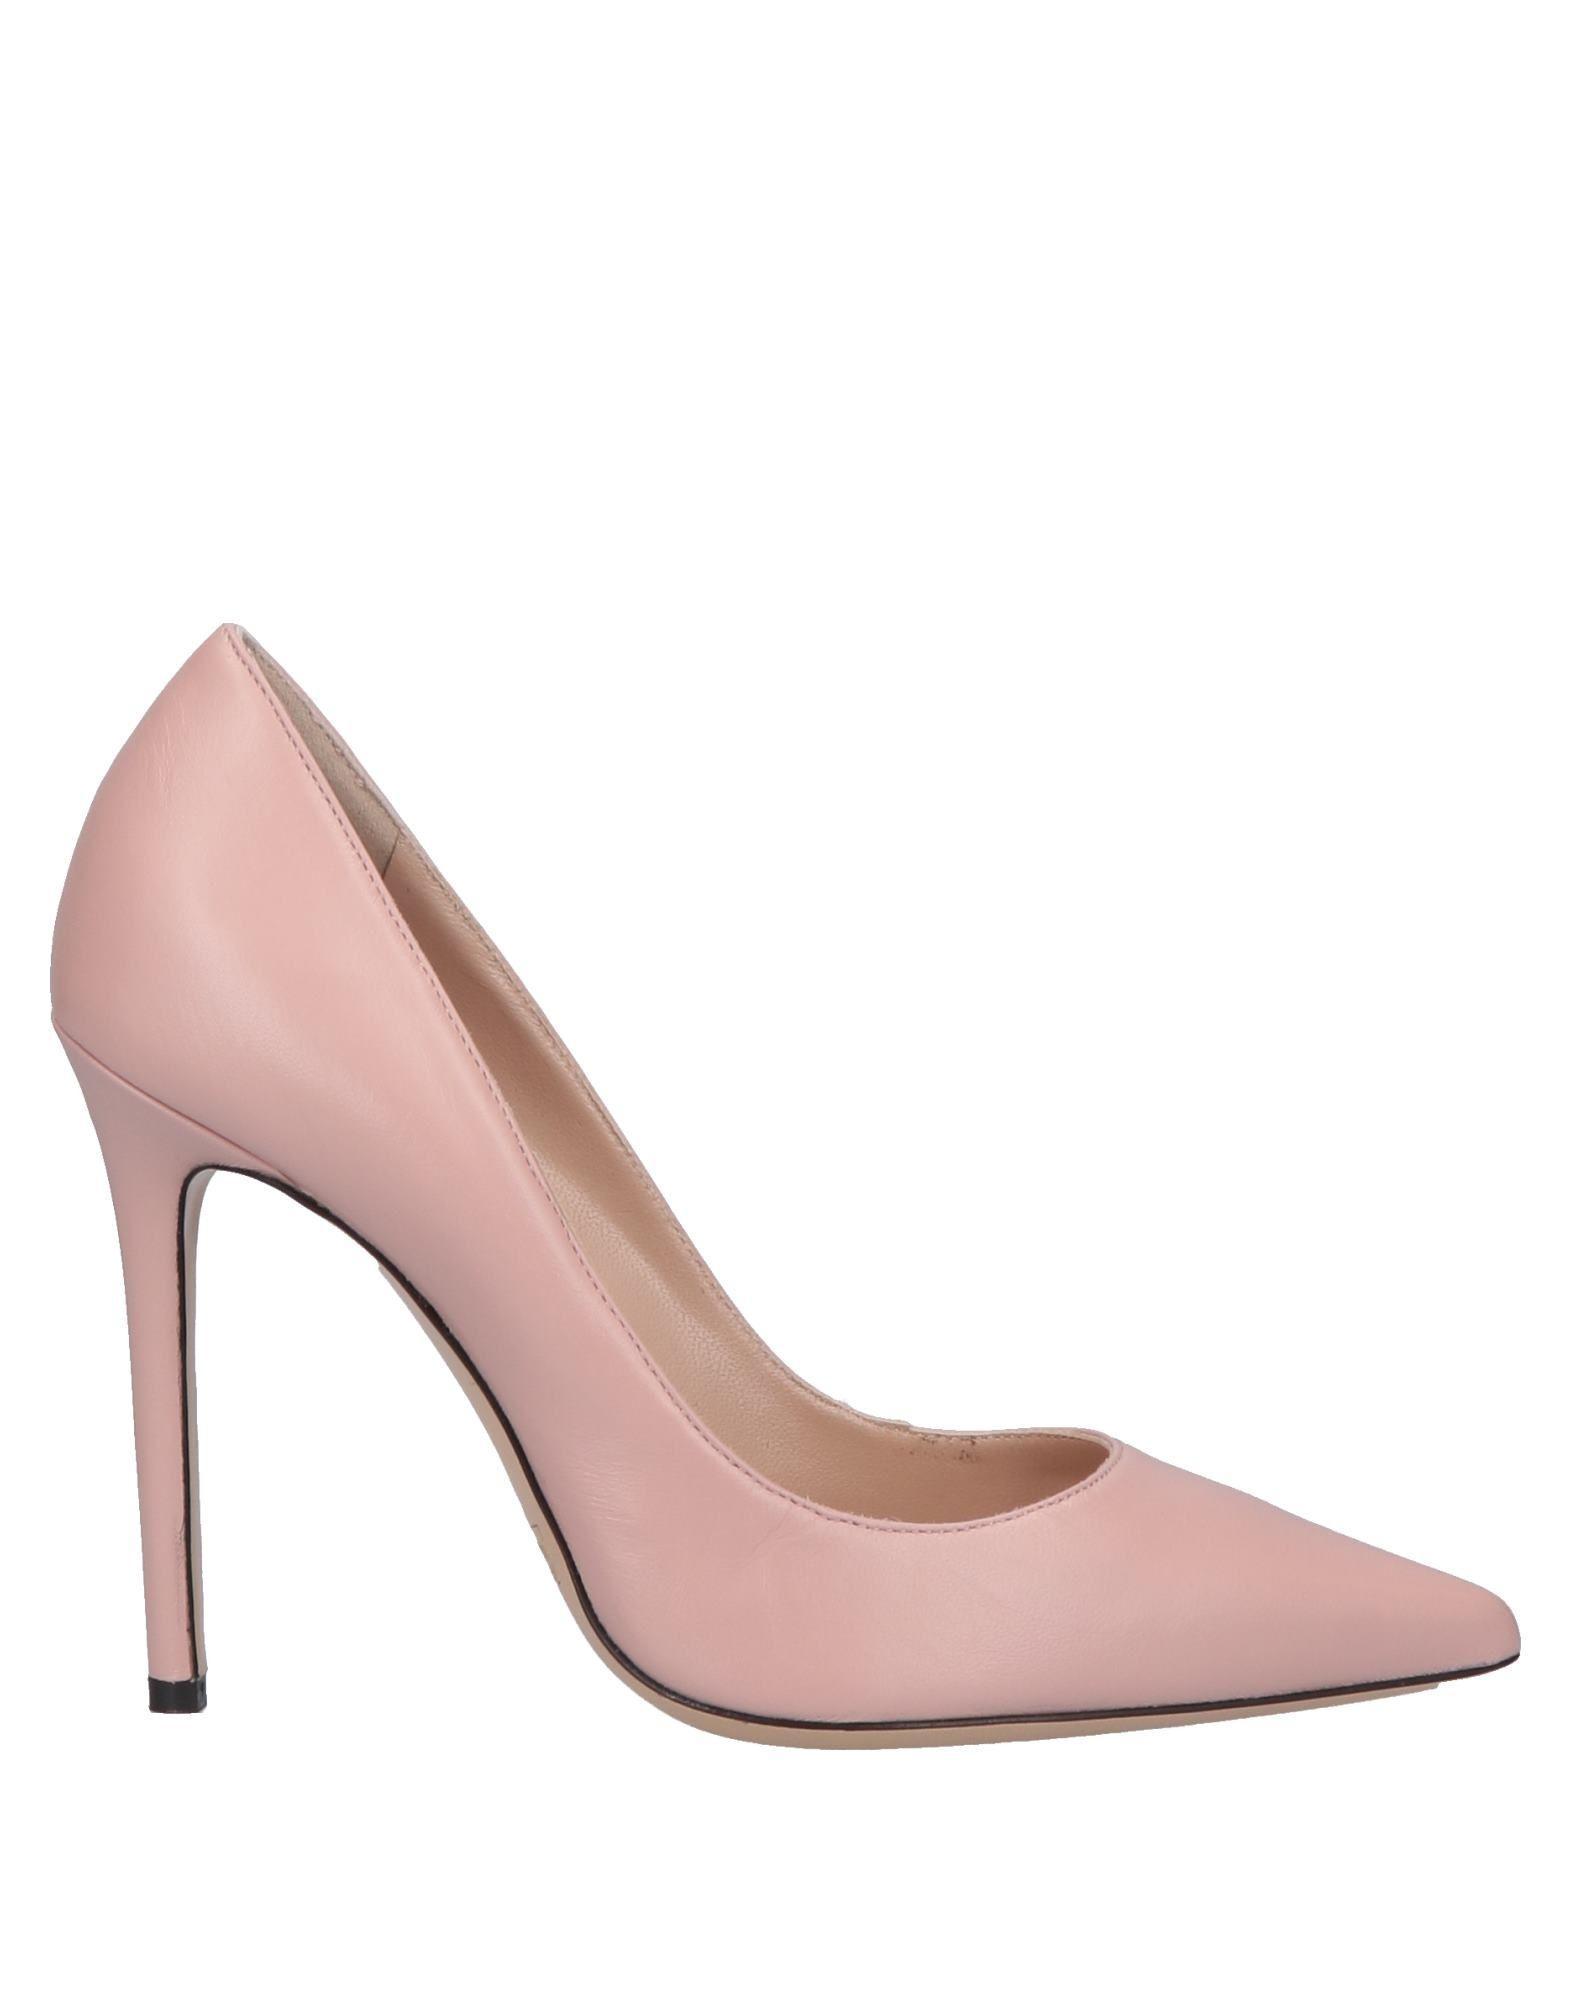 sports shoes ac426 40df9 Fratelli Rossetti Pink Pump